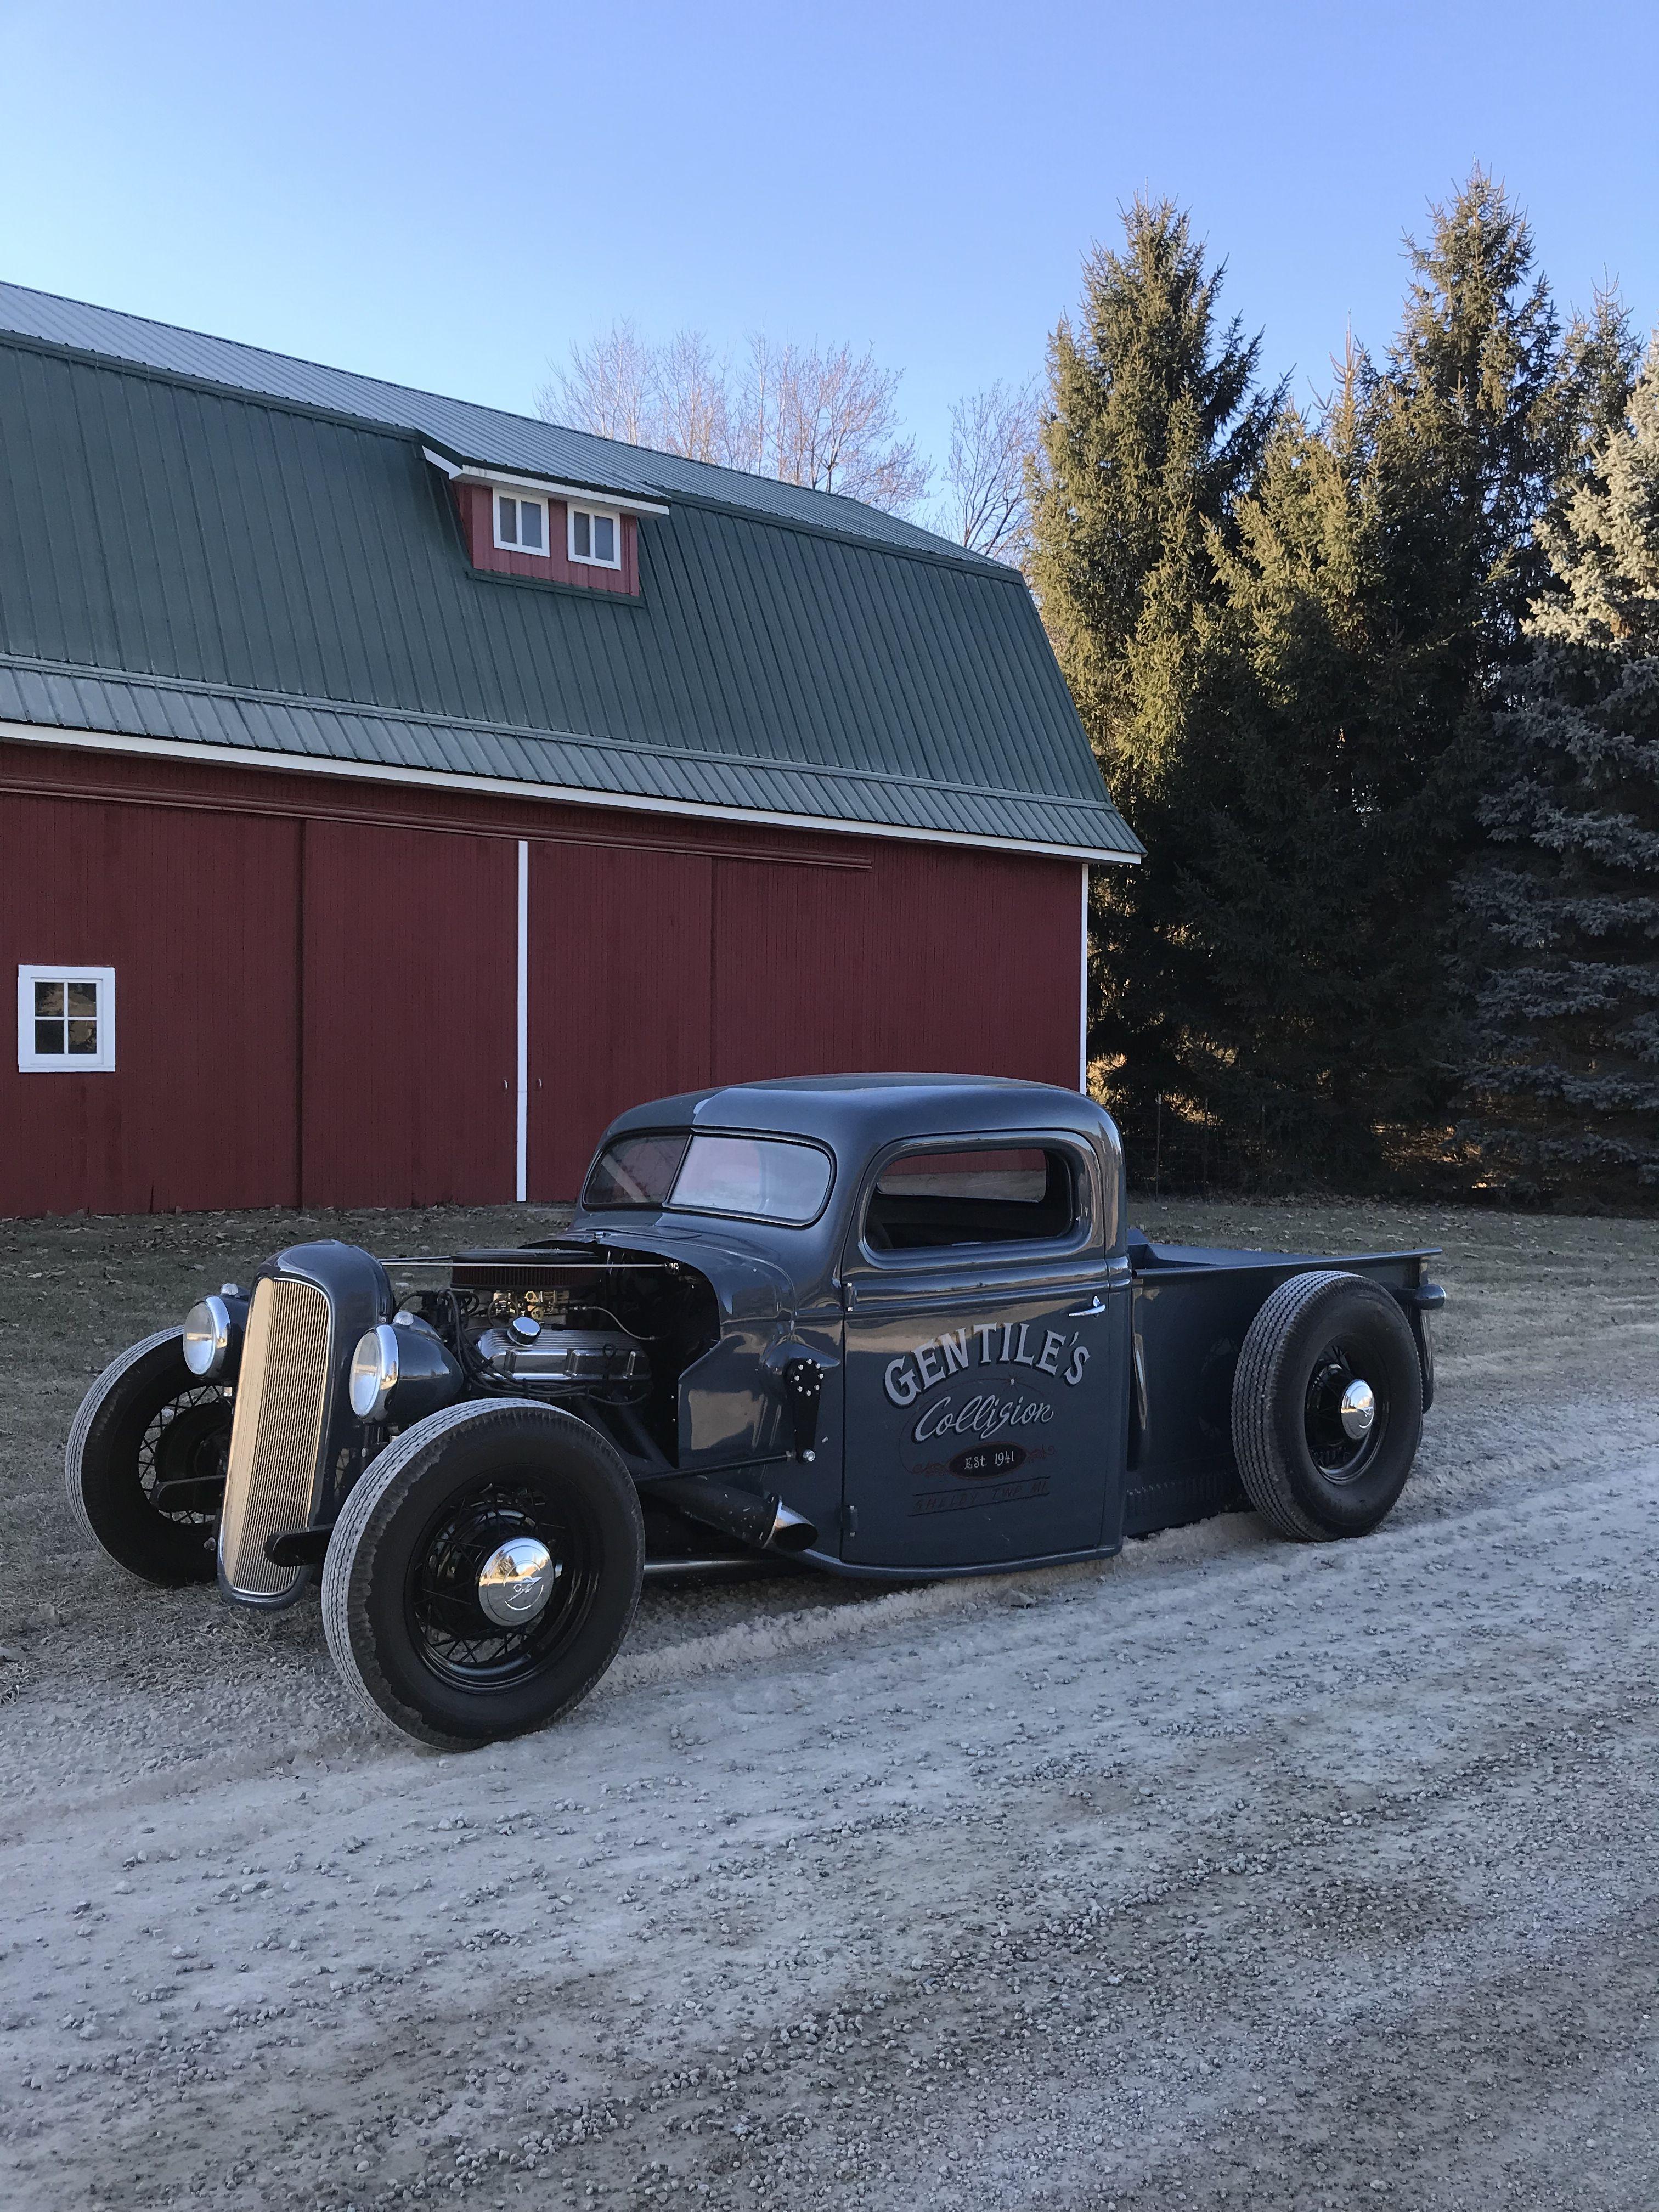 Rat Rod Hot Rod Traditional Jalopy 1937 Ford Pickup Rat Rods Truck Rat Rod Hot Rod Pickup